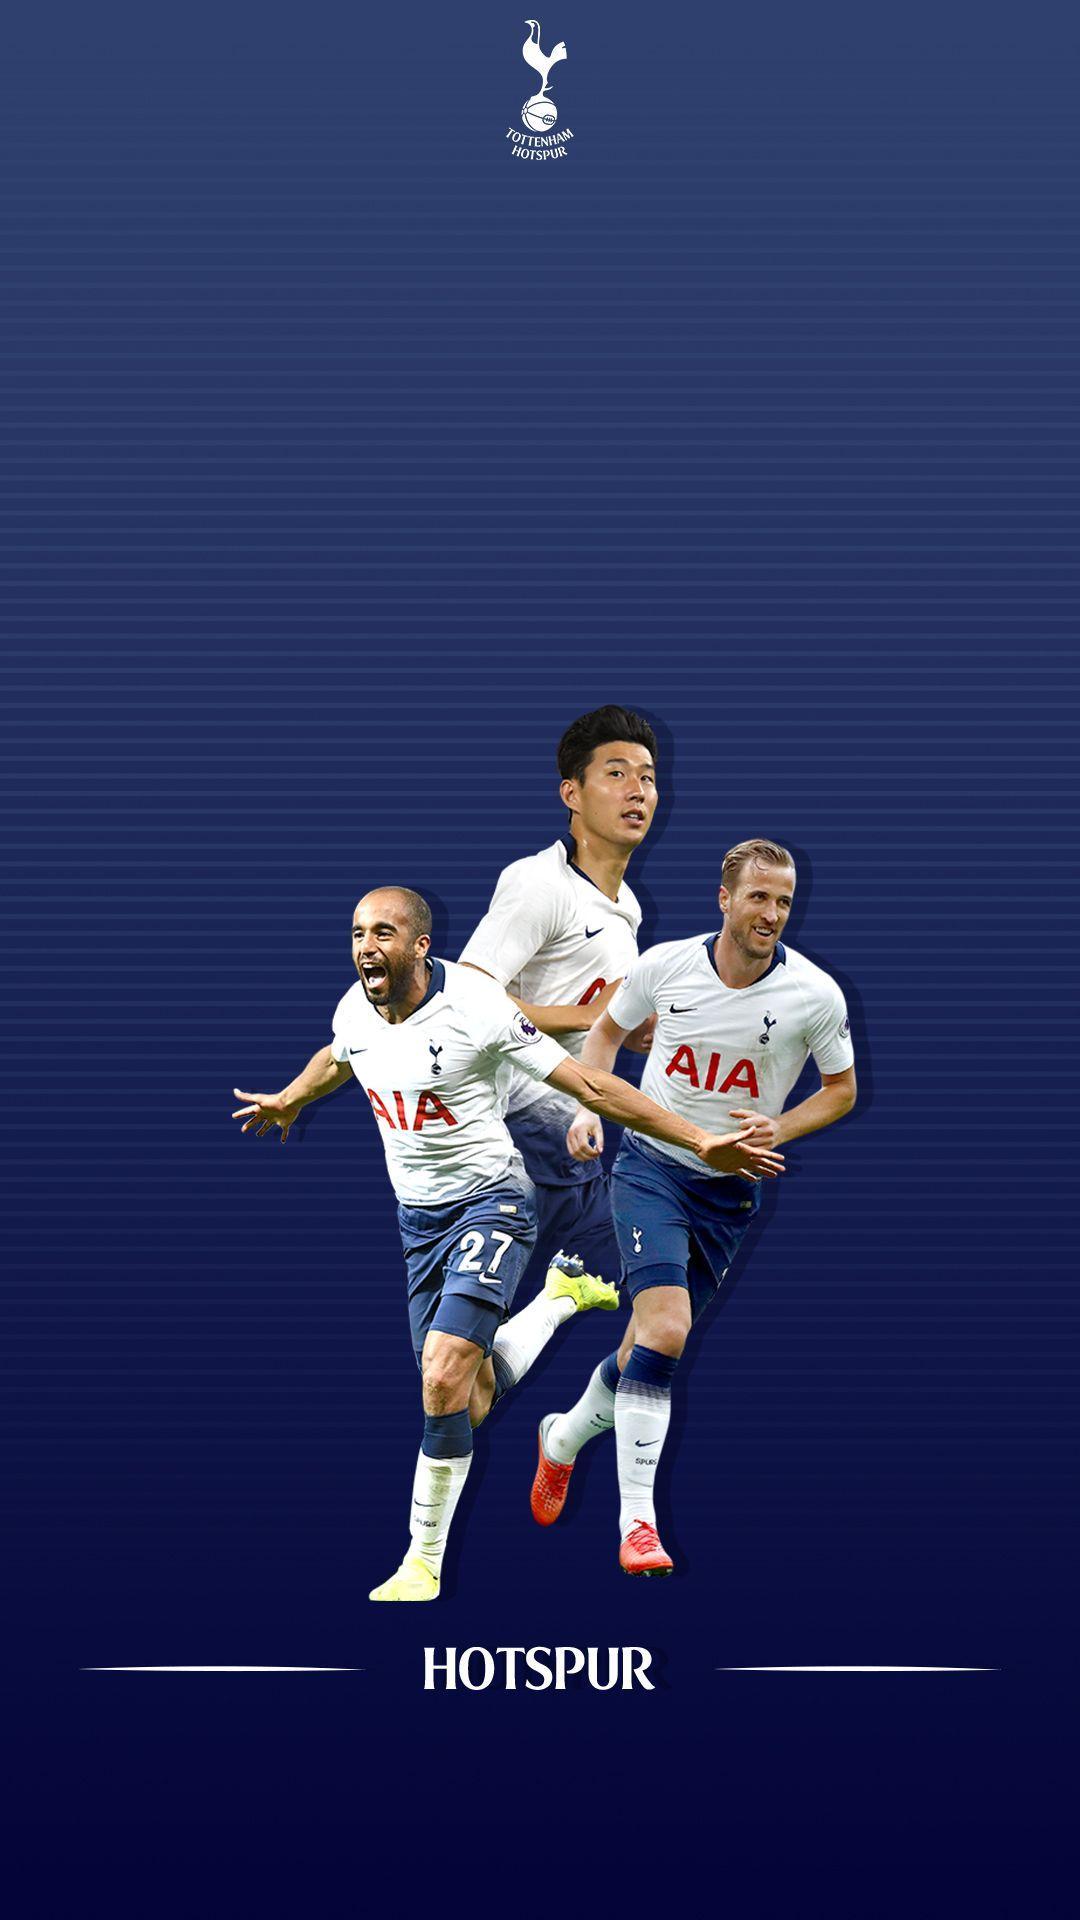 Tottenham Iphone Wallpapers Top Free Tottenham Iphone Backgrounds Wallpaperaccess